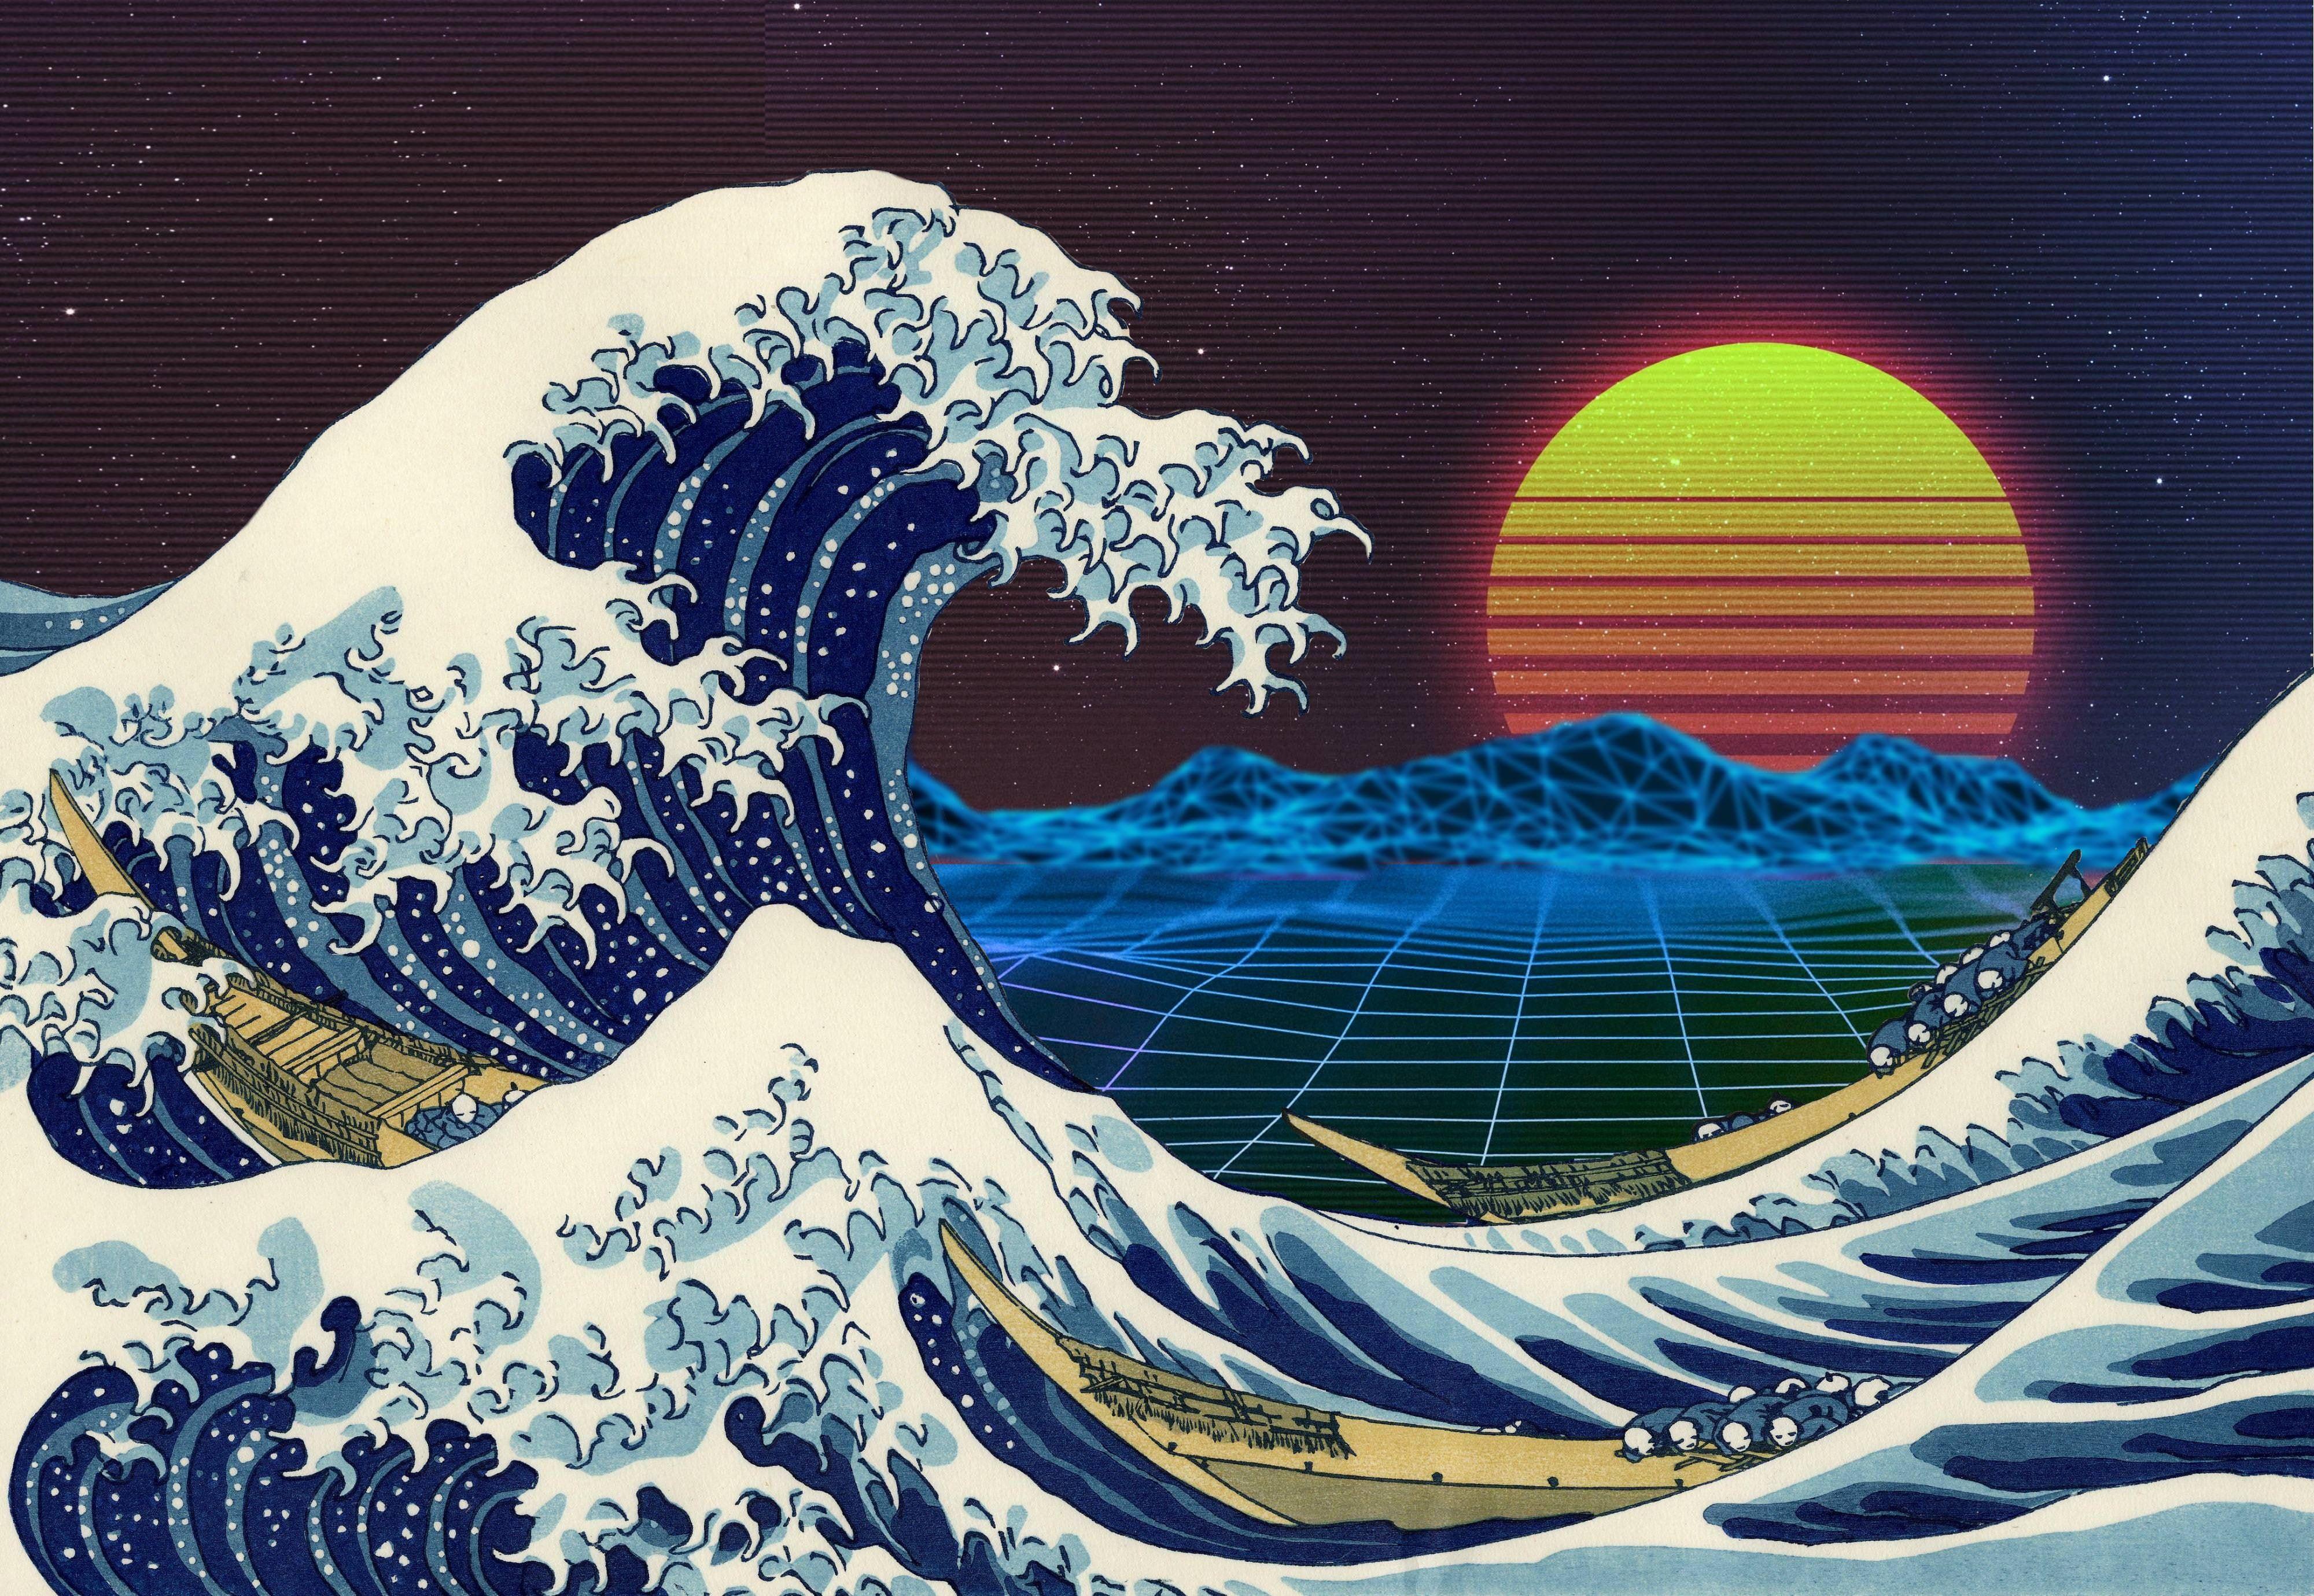 Hd Wallpaper Retrowave Retro Style Sea Waves Sunset Purple Great Wave Off Kanagawa Retrowave Wallpaper The Great Wave Off Kanagawa